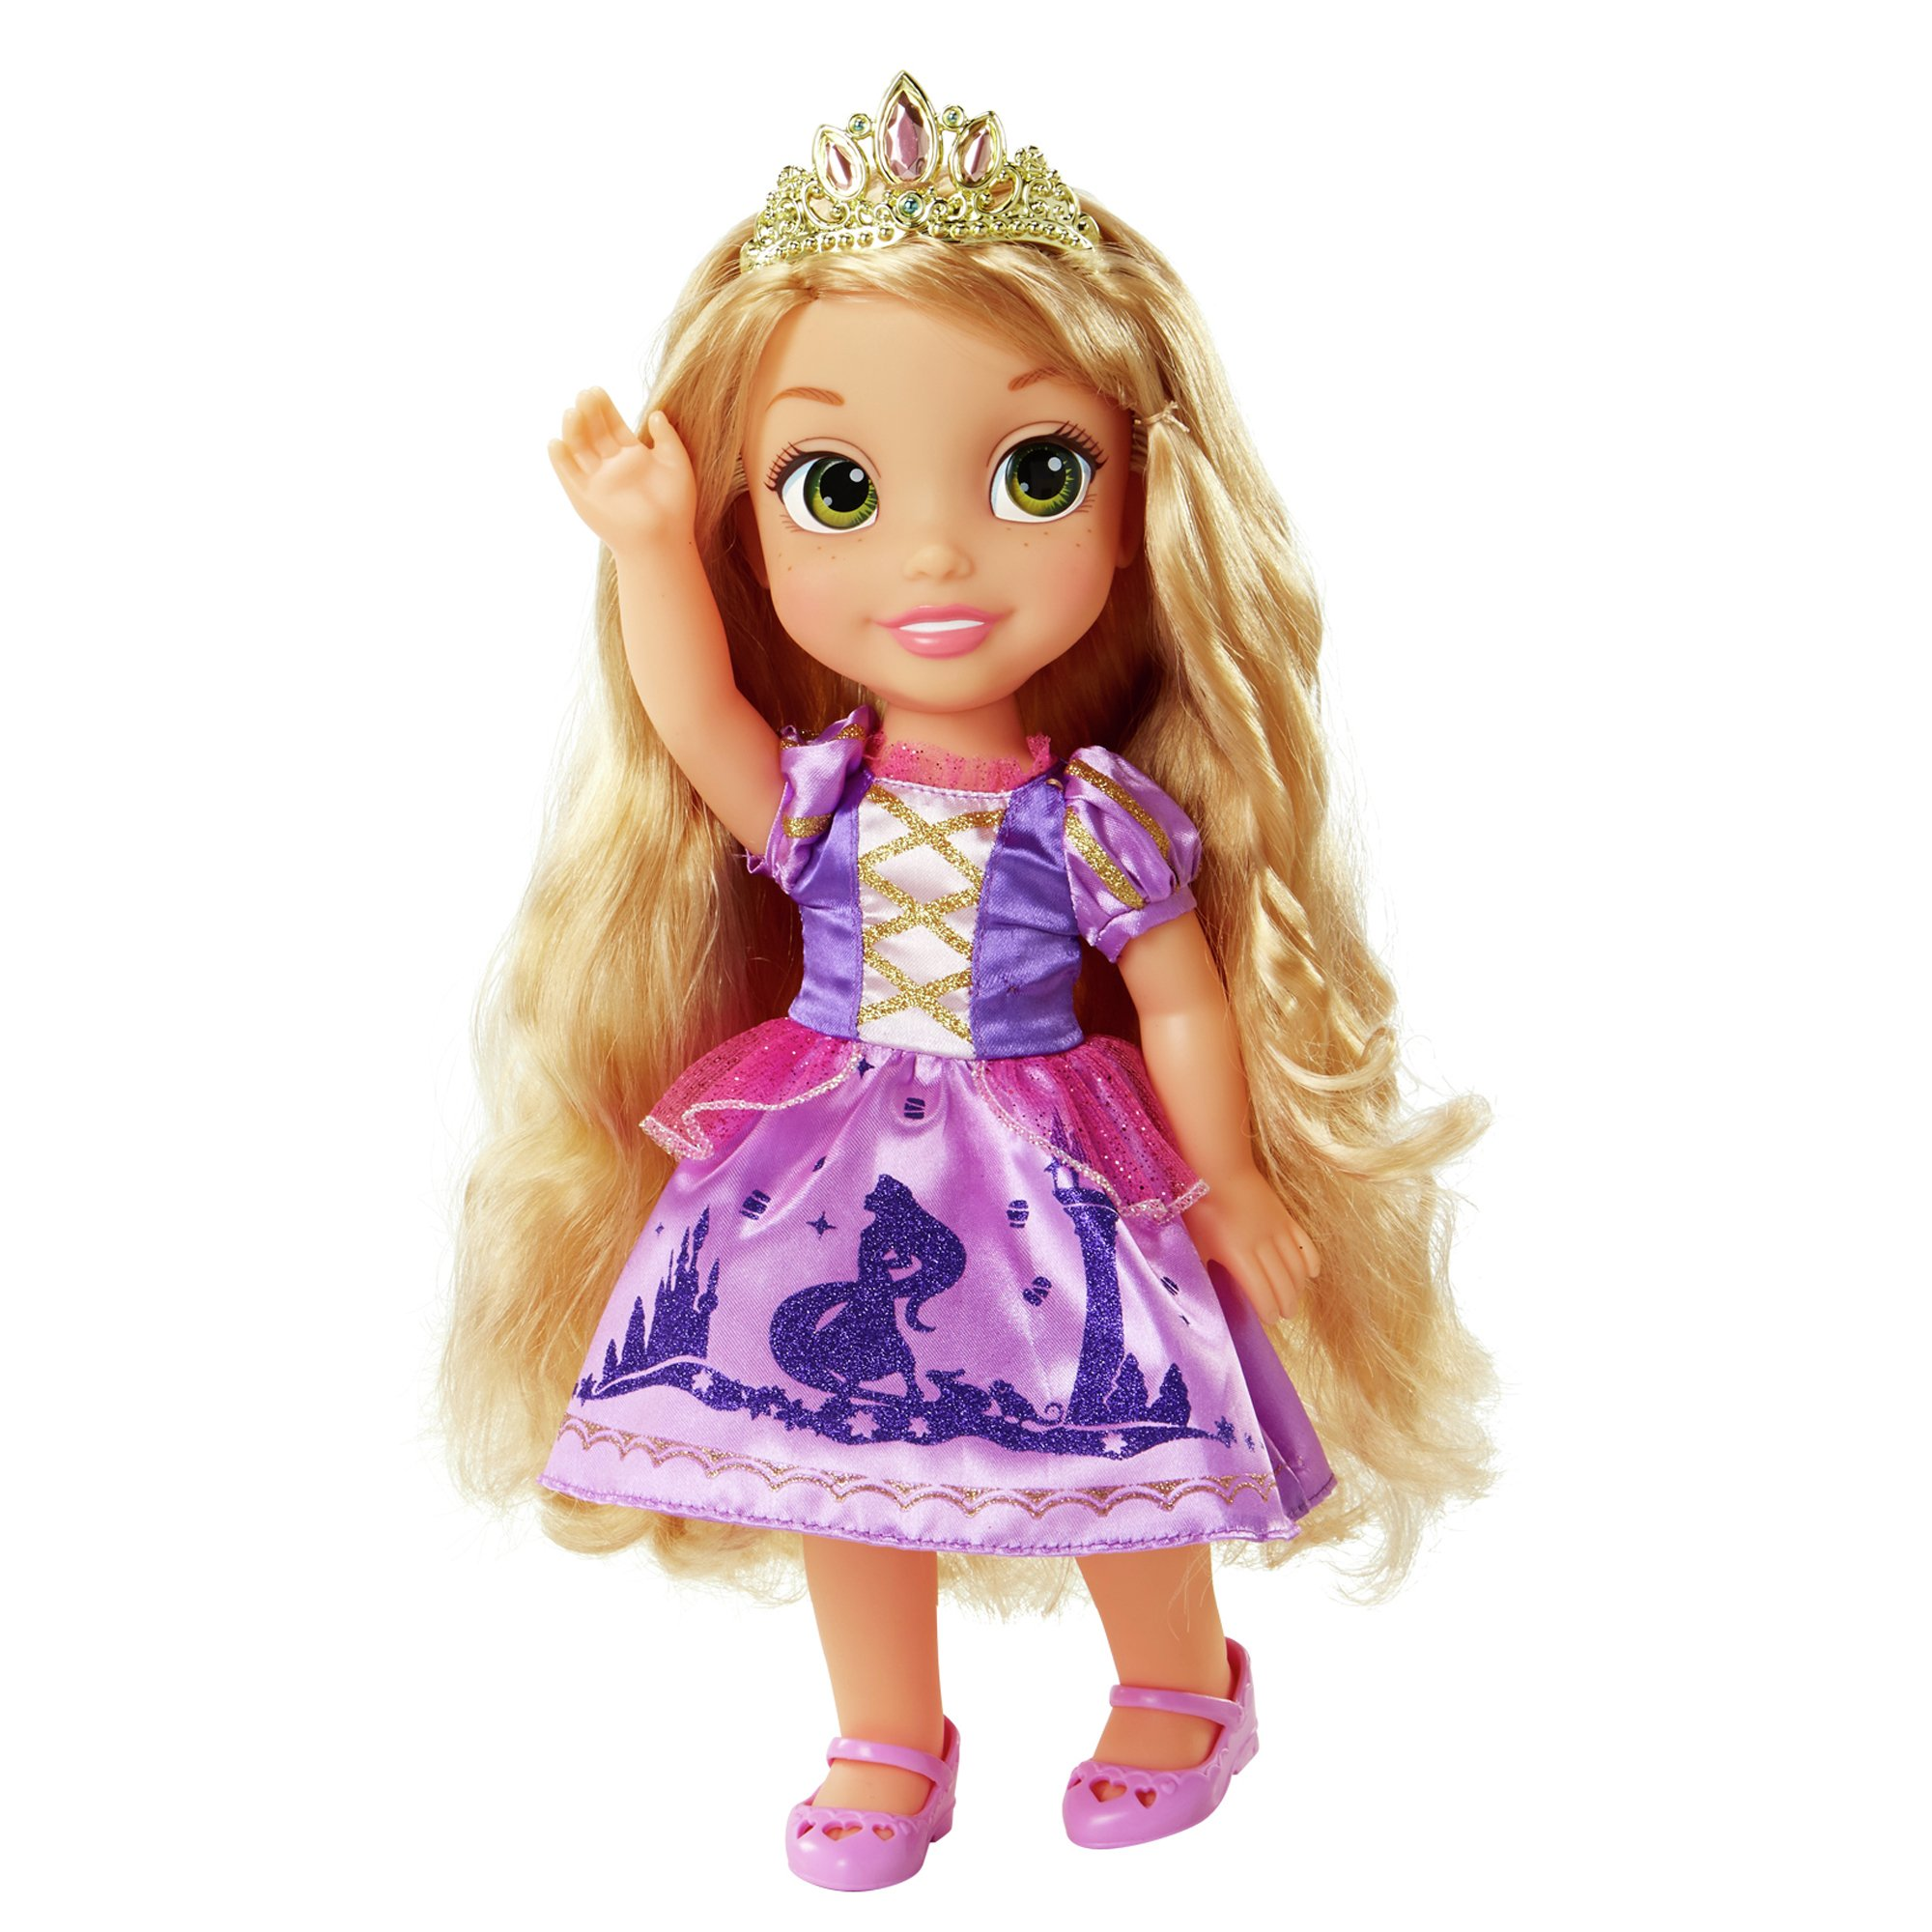 Beaded door curtains argos - Beaded Door Curtains Argos Peterlee Disney Princess Toddler Doll Rapunzel